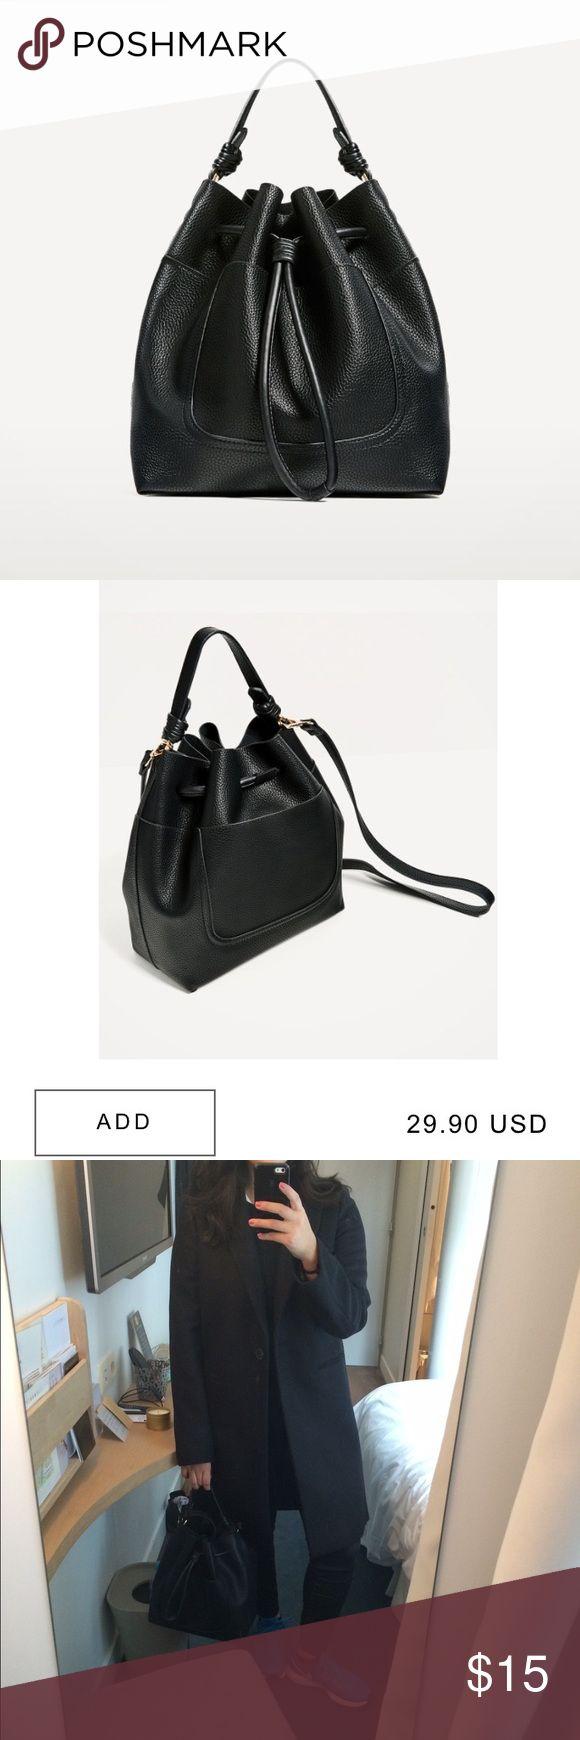 Zara bucket bag Bought it in Paris this last nov. In perfect conditions still 30 bucks online. Zara Bags Satchels